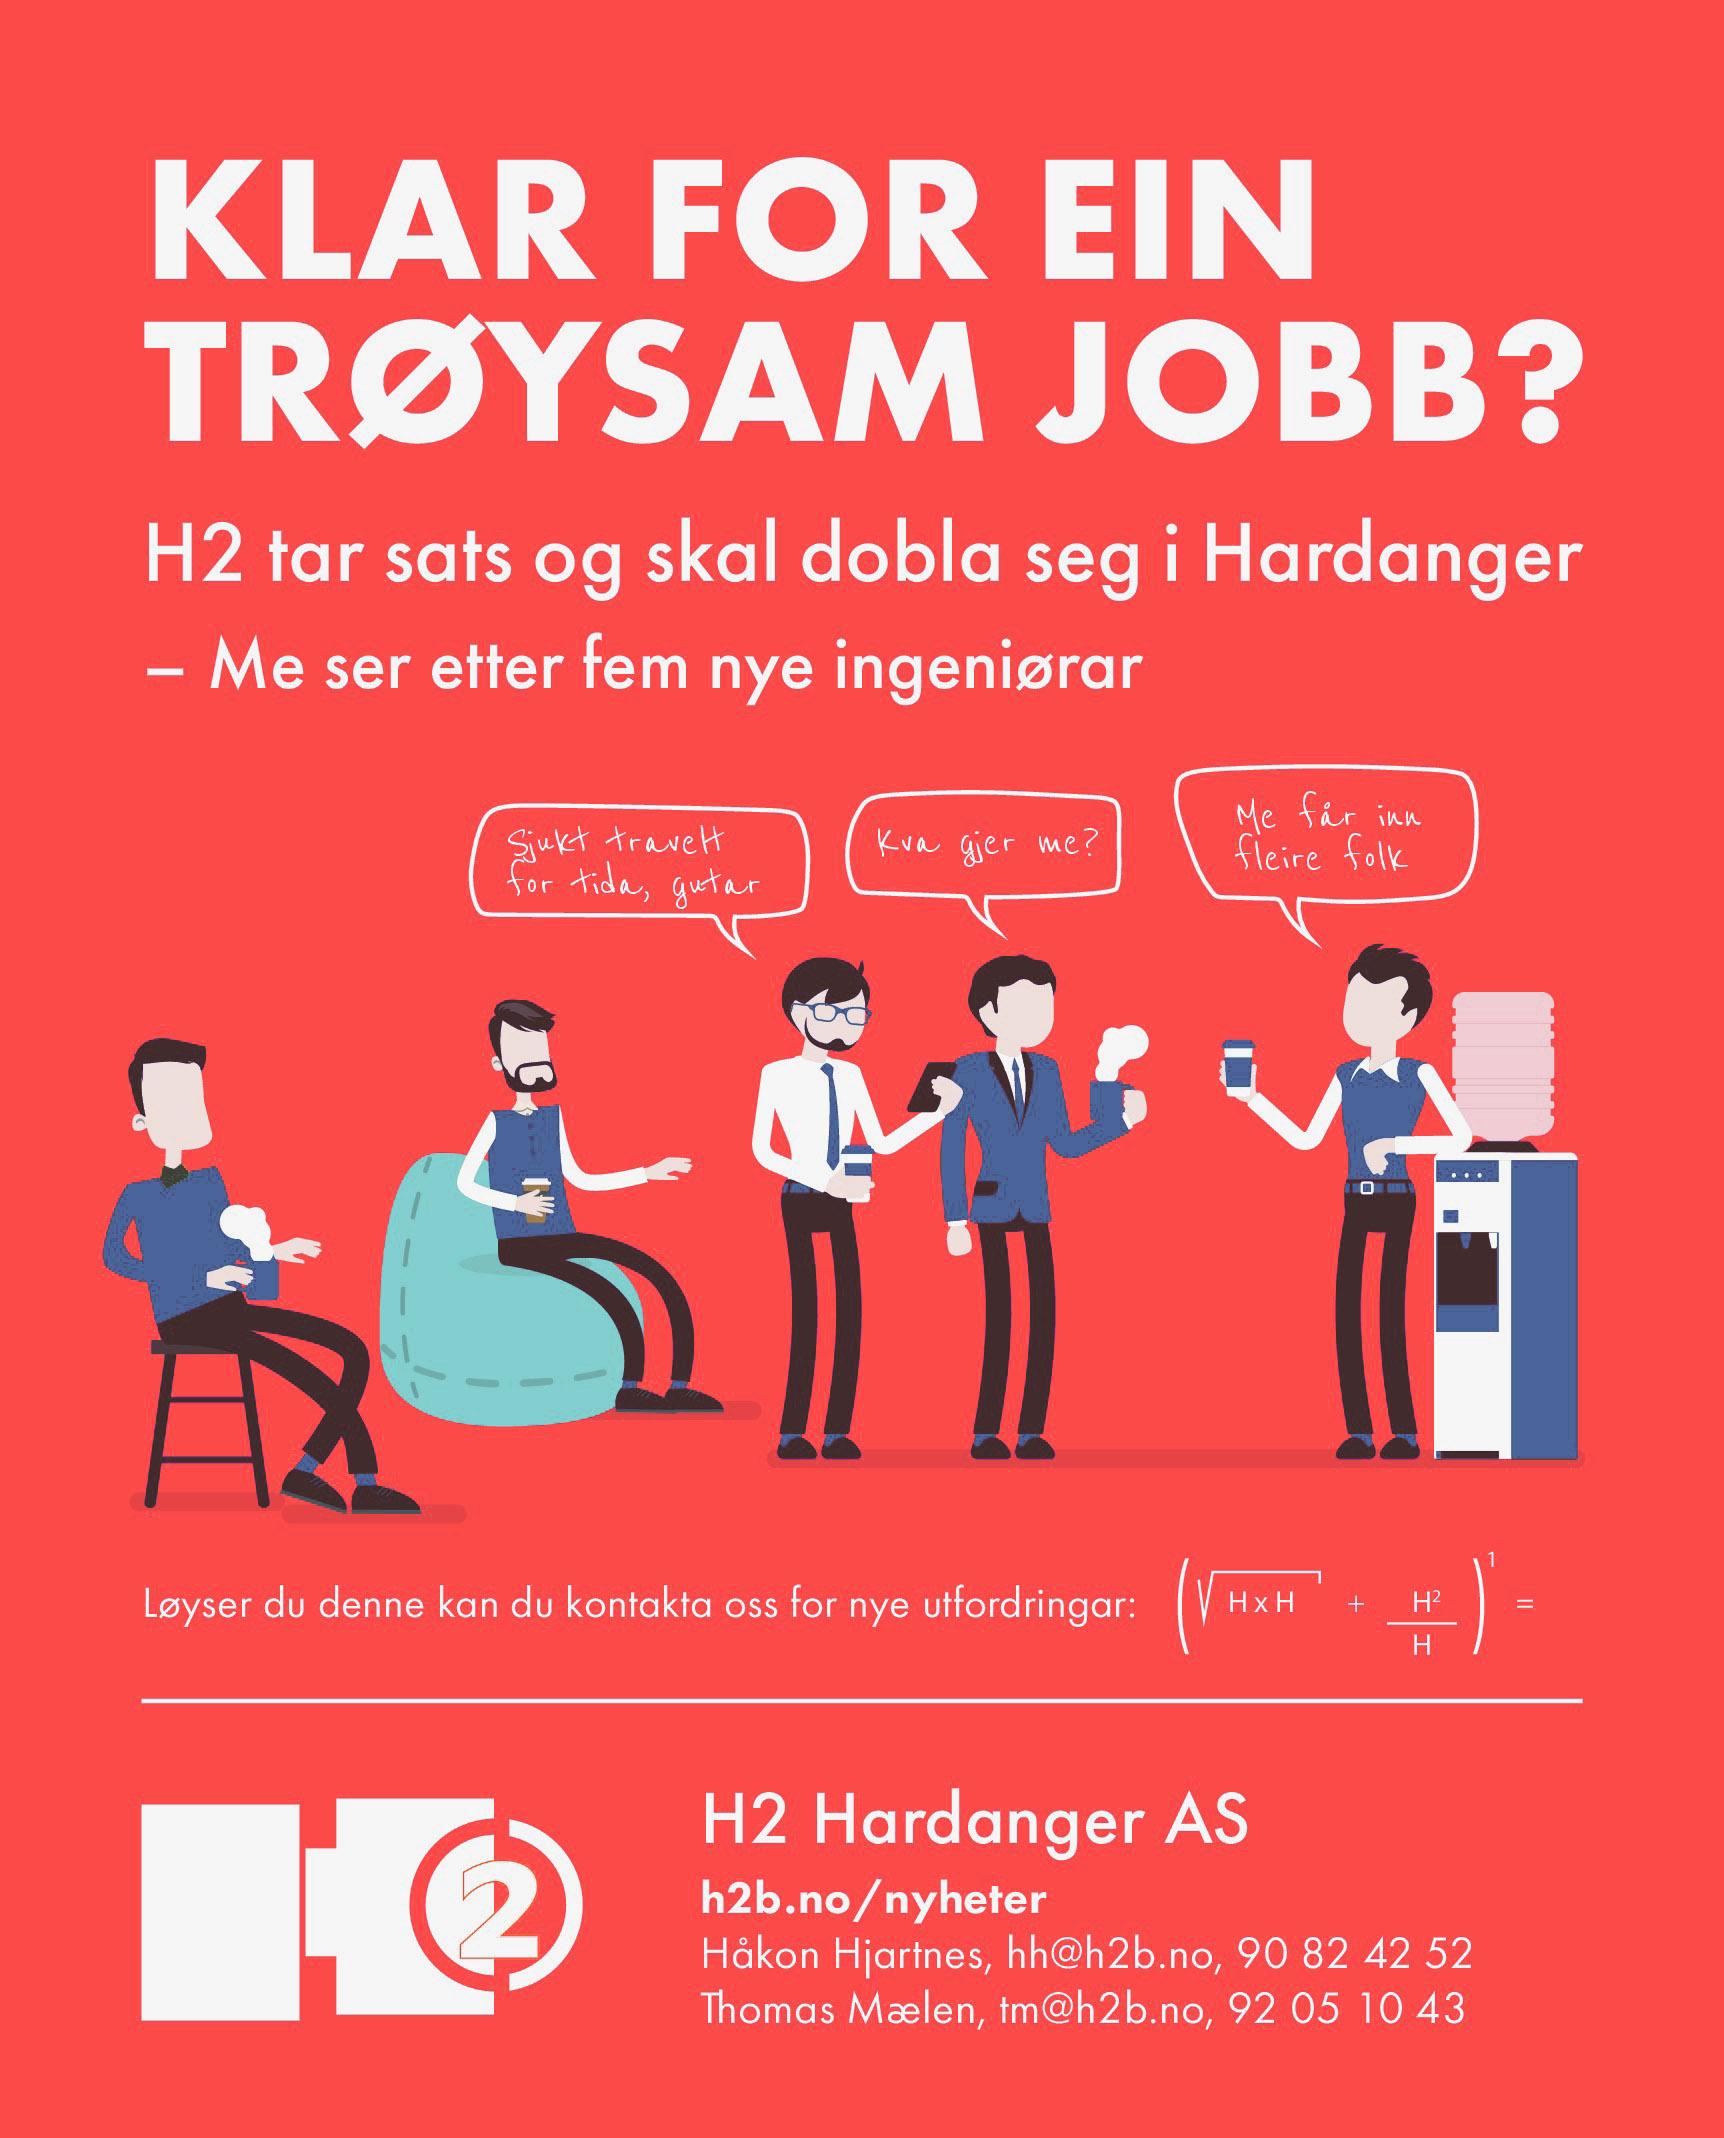 H2 tar sats i Hardanger